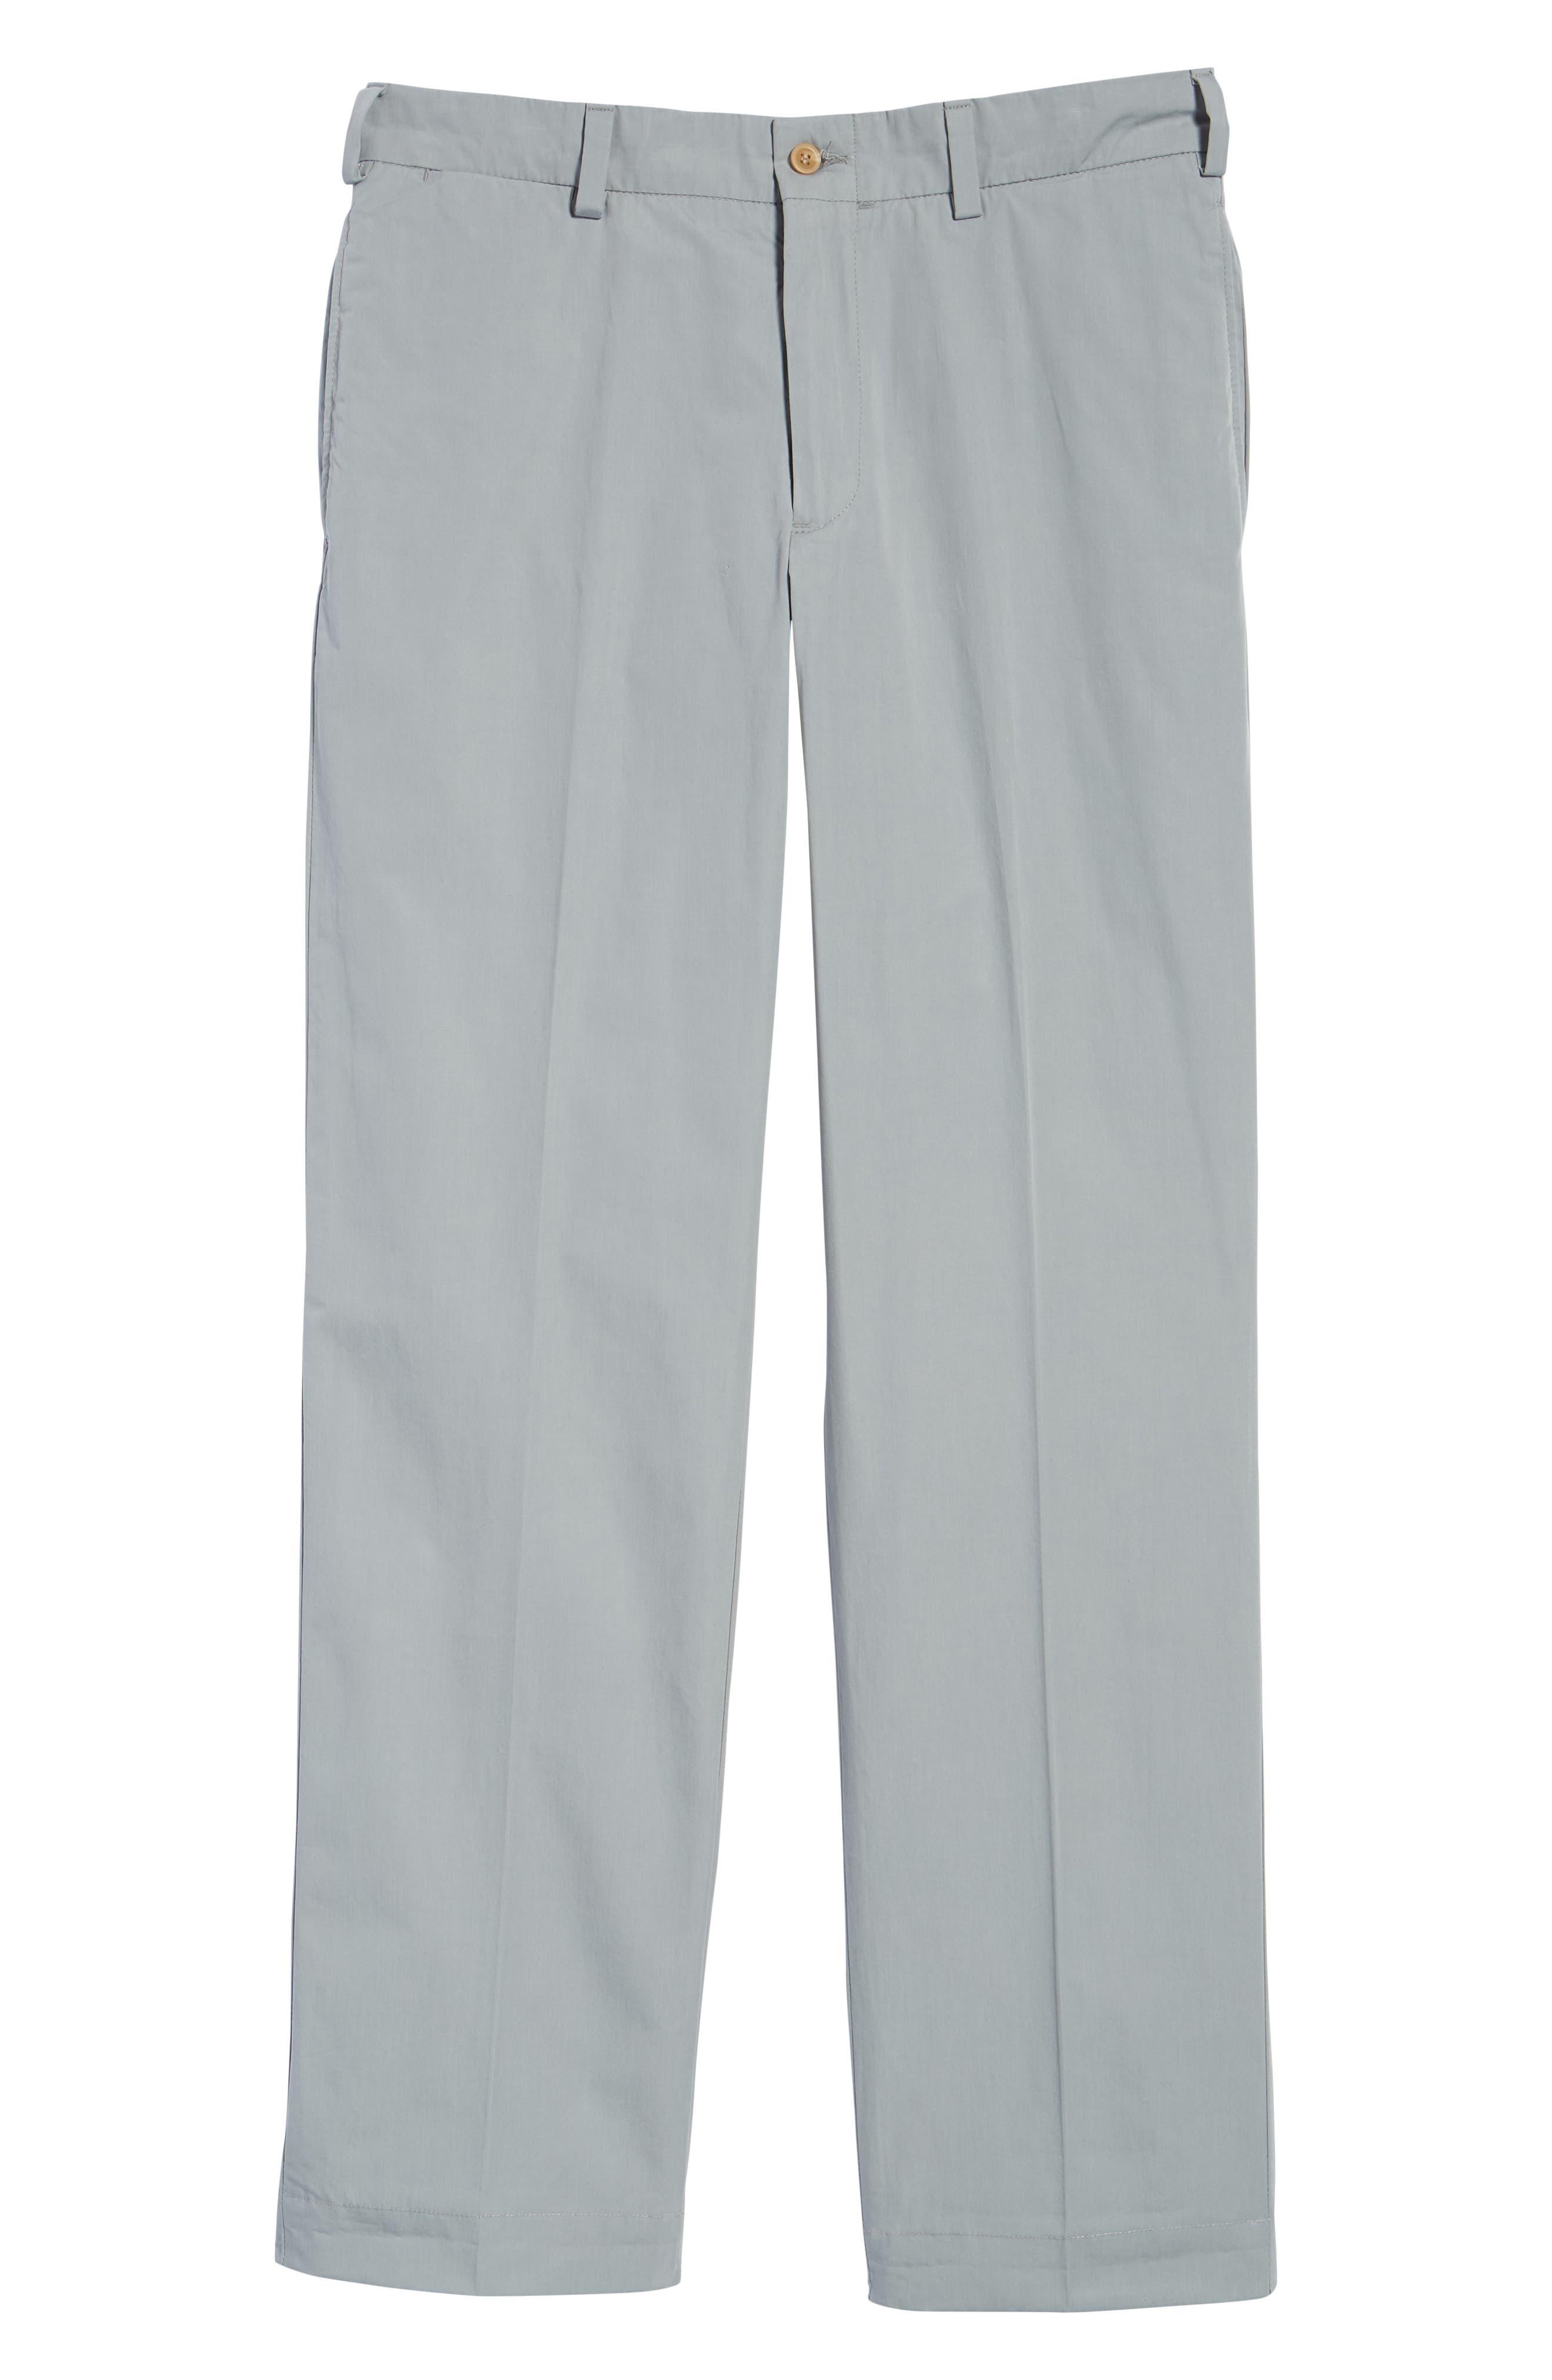 M2 Classic Fit Flat Front Tropical Cotton Poplin Pants,                             Alternate thumbnail 6, color,                             Nickel